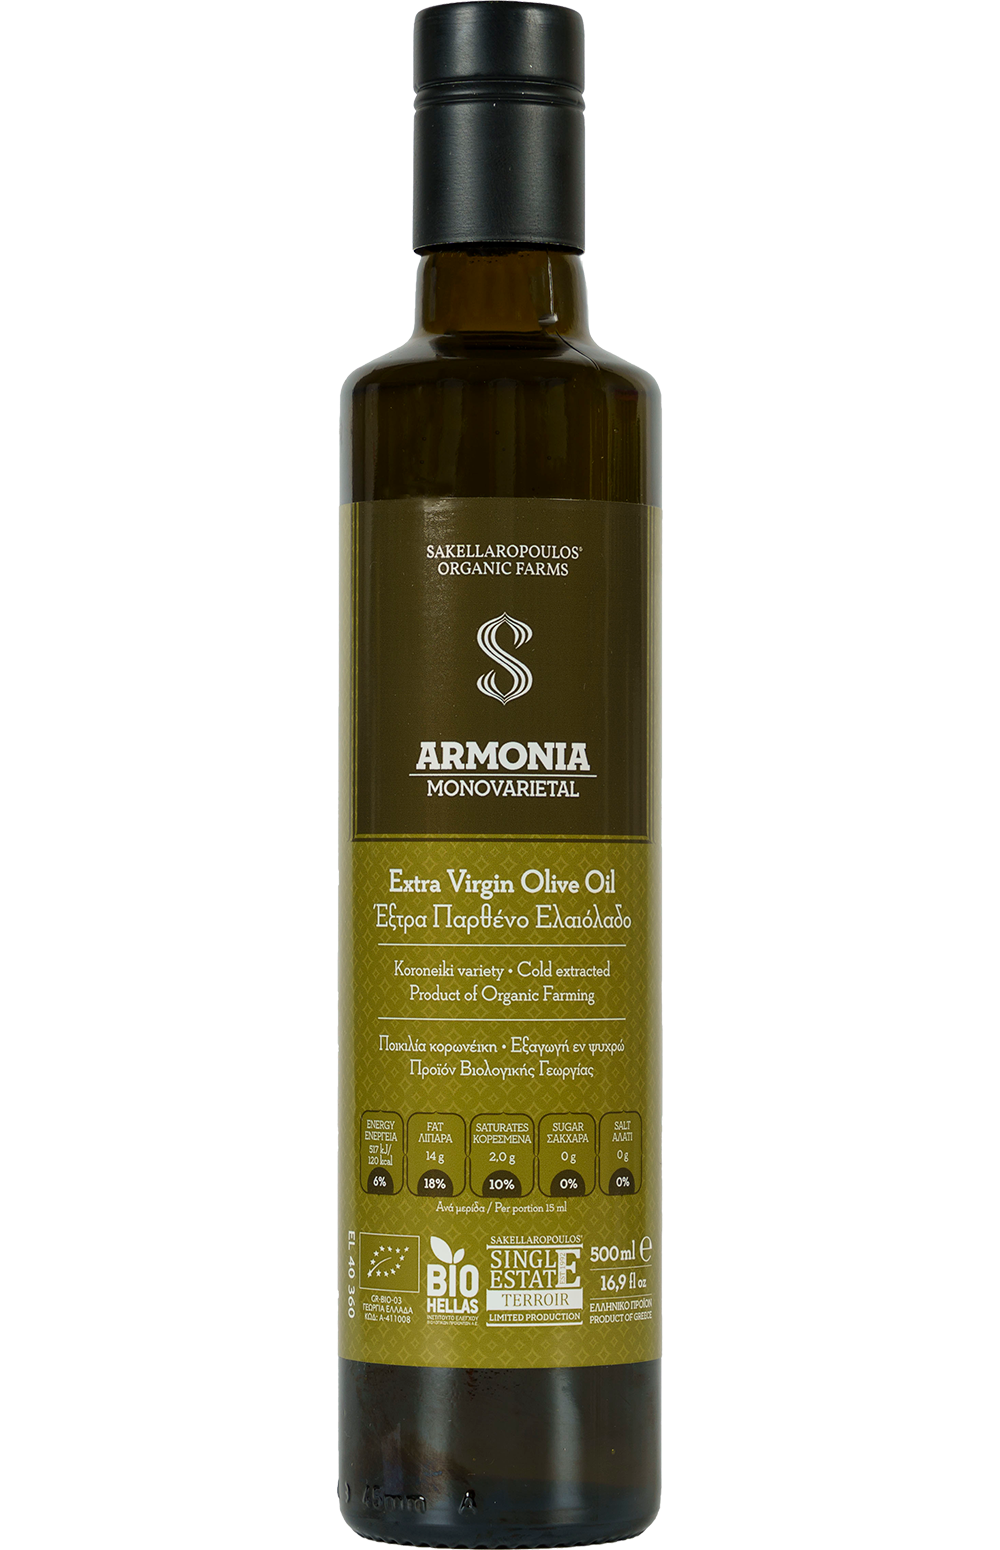 Armonia Monovarietal Organic EVOO